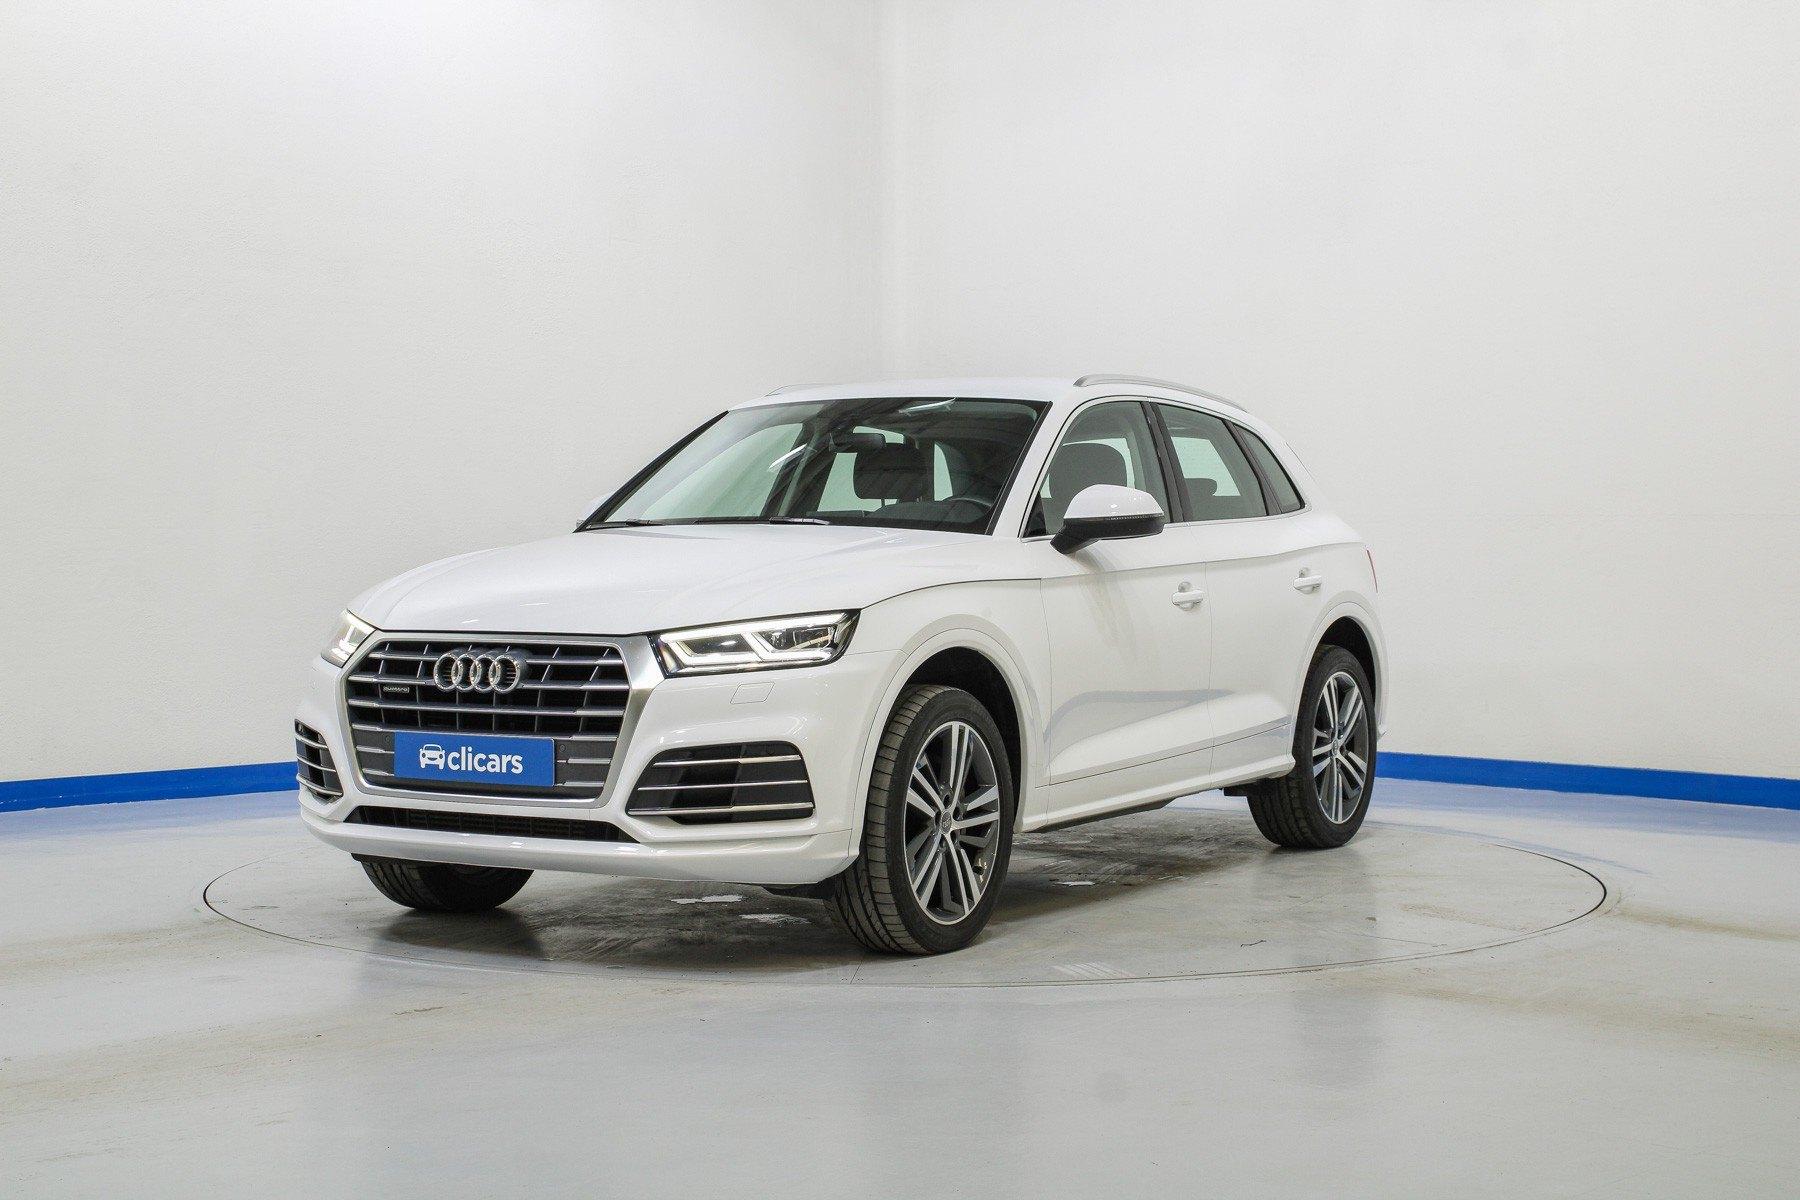 Audi Q5 Gasolina S line 2.0 TFSI 185kW quattro S tronic 1